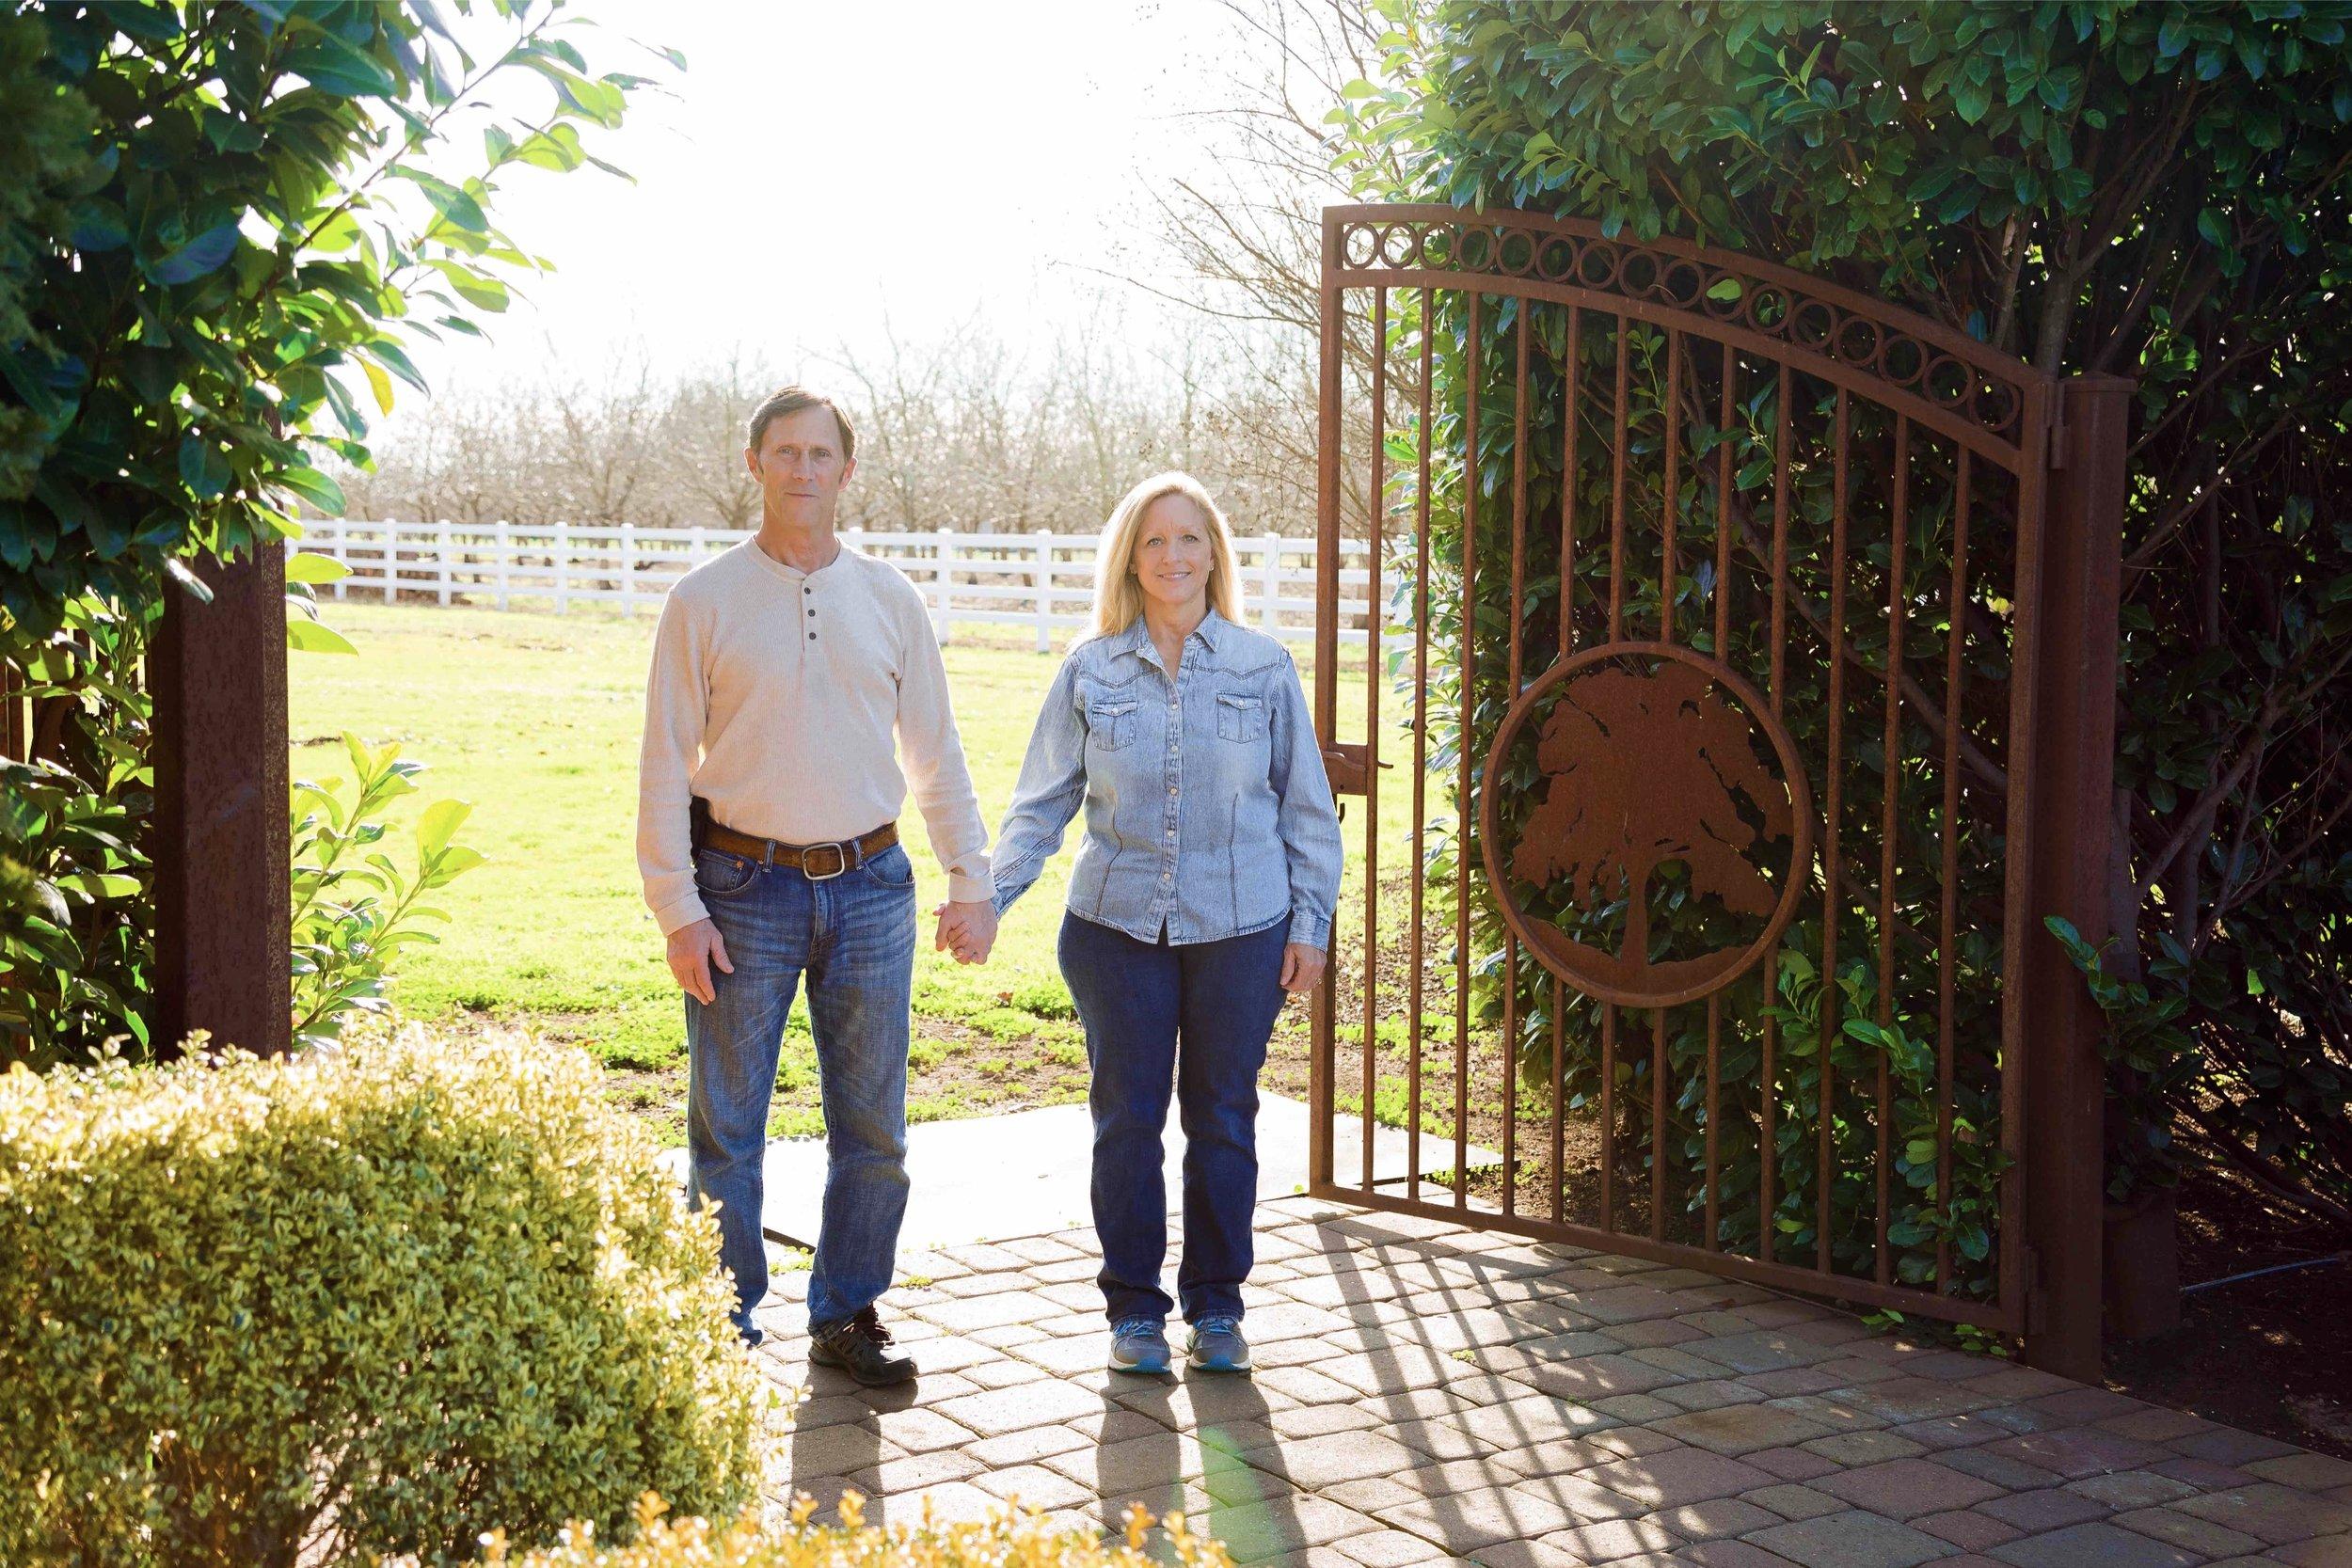 Iron Gate Inn Chico California Wedding Photographer 12.jpg